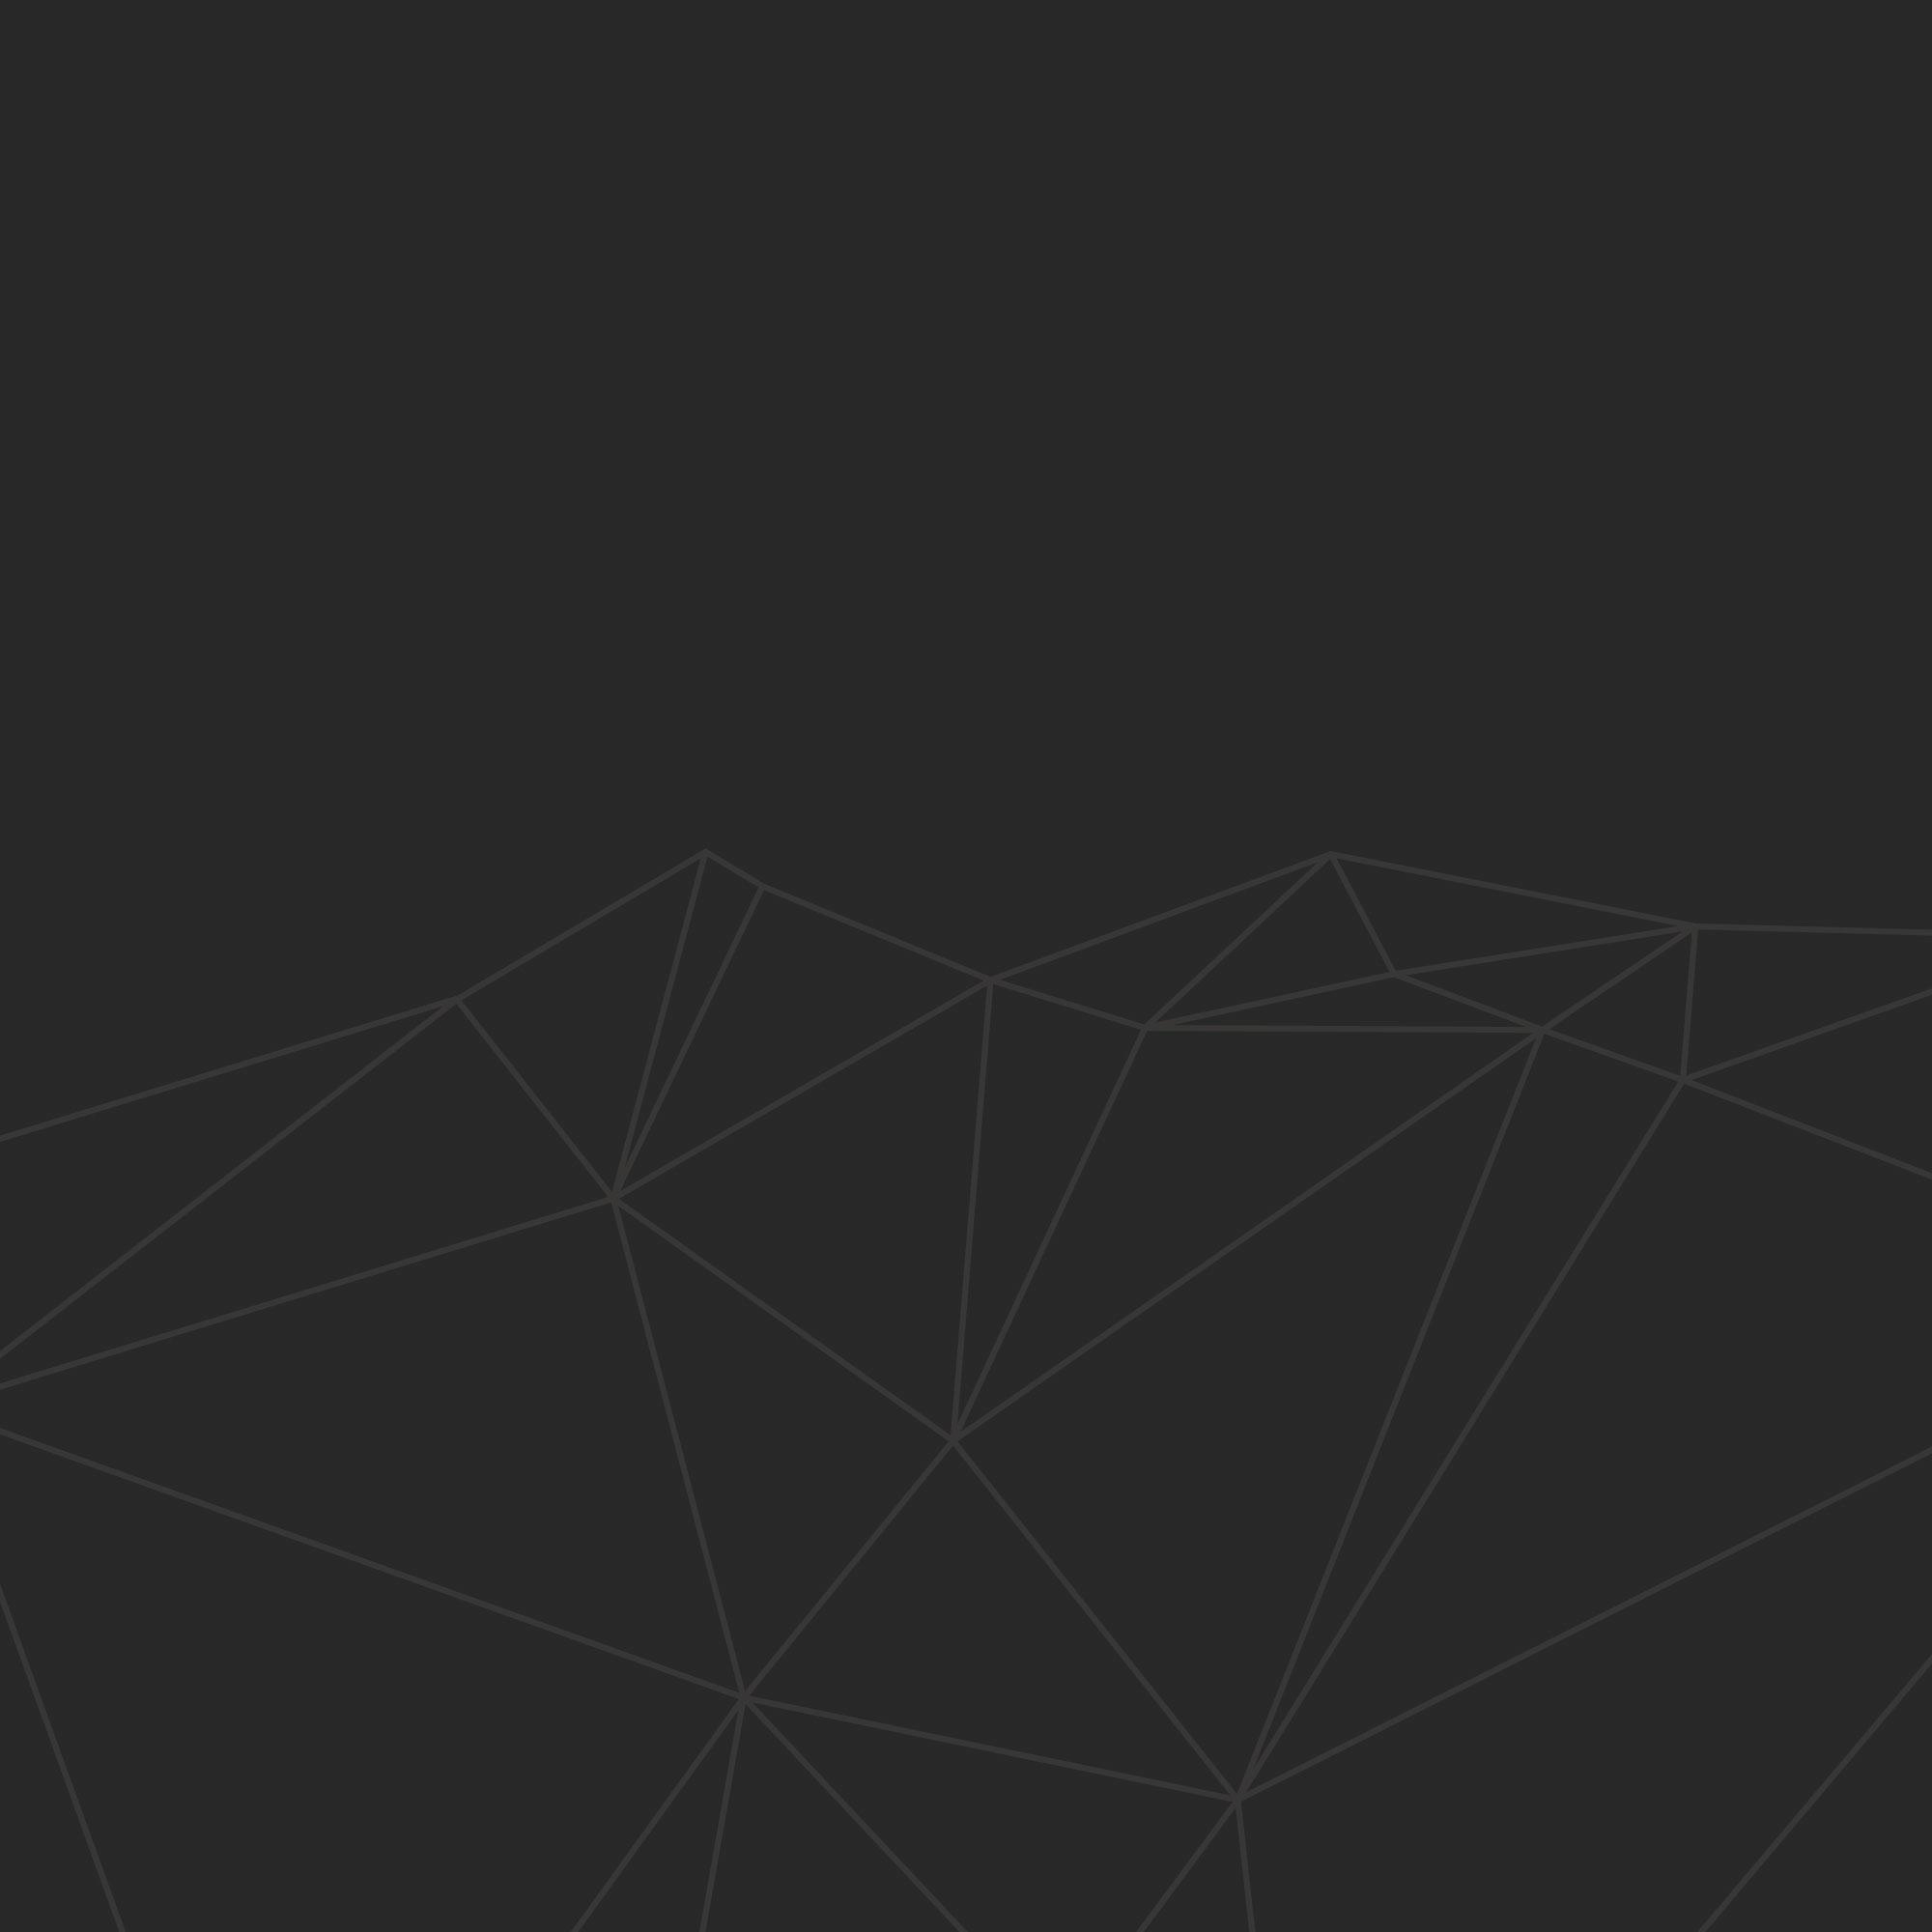 https://sconcept.be/wp-content/uploads/2020/08/v-build-3.jpg